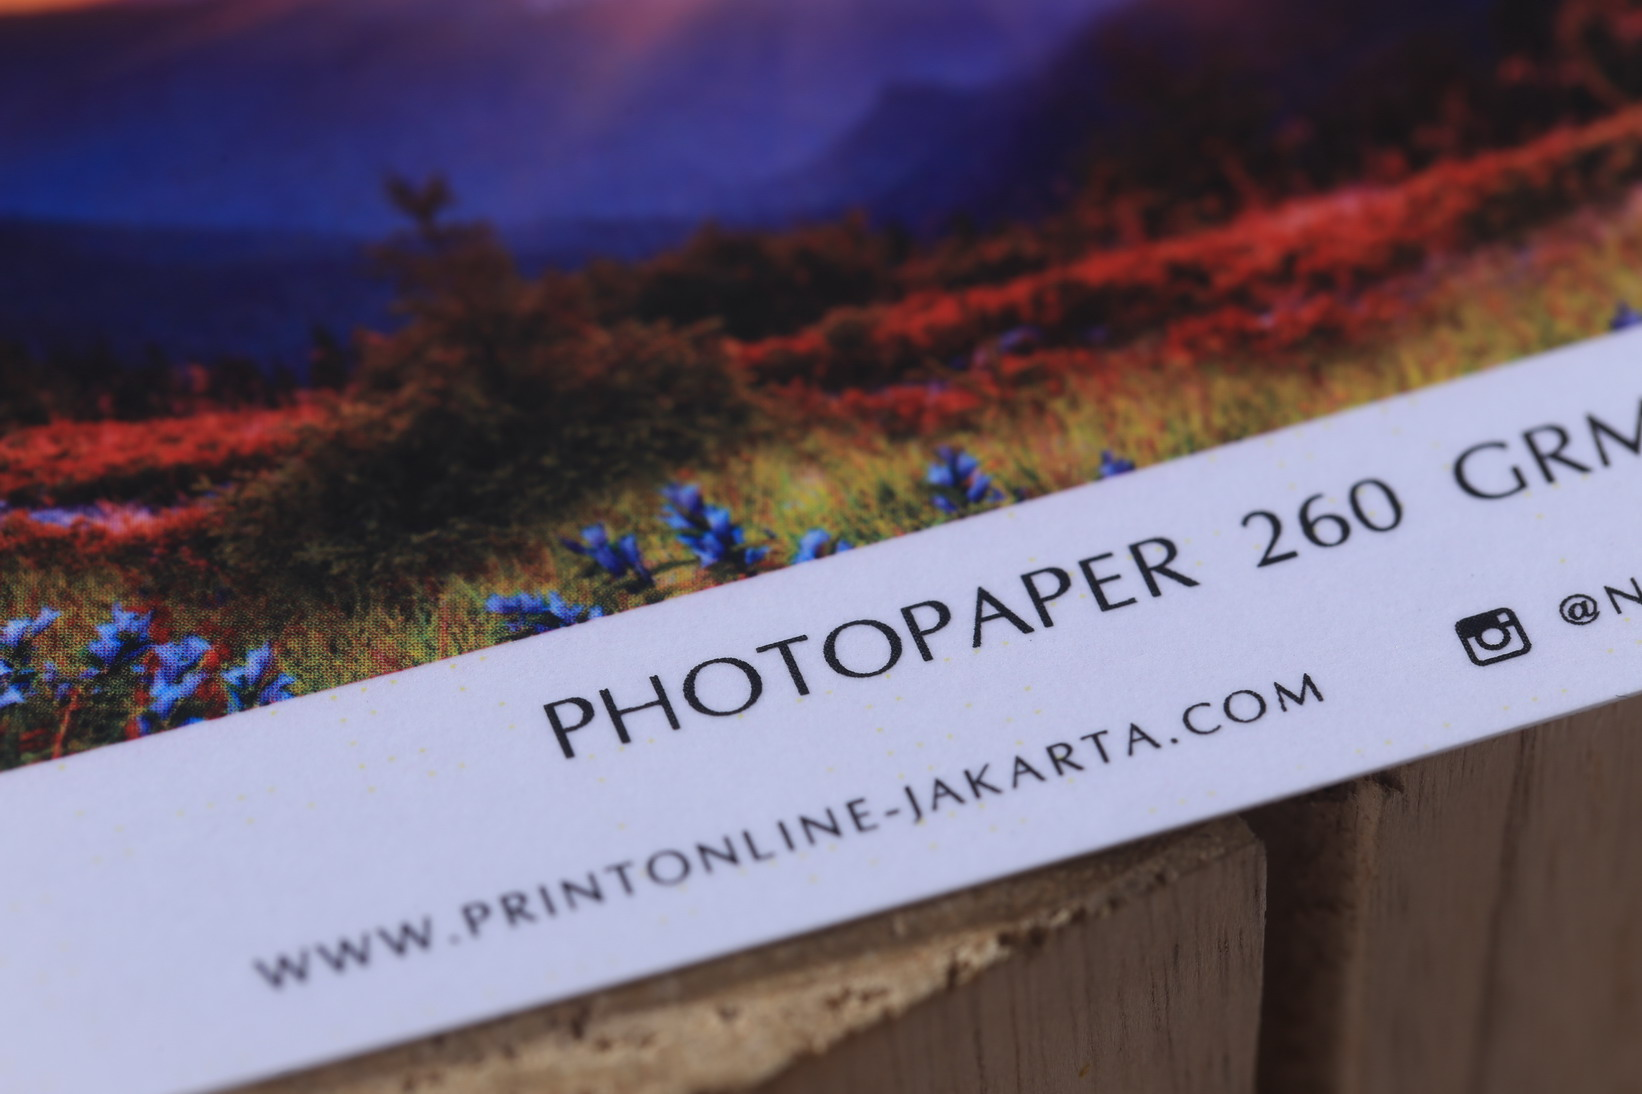 Photopaper 260 grm